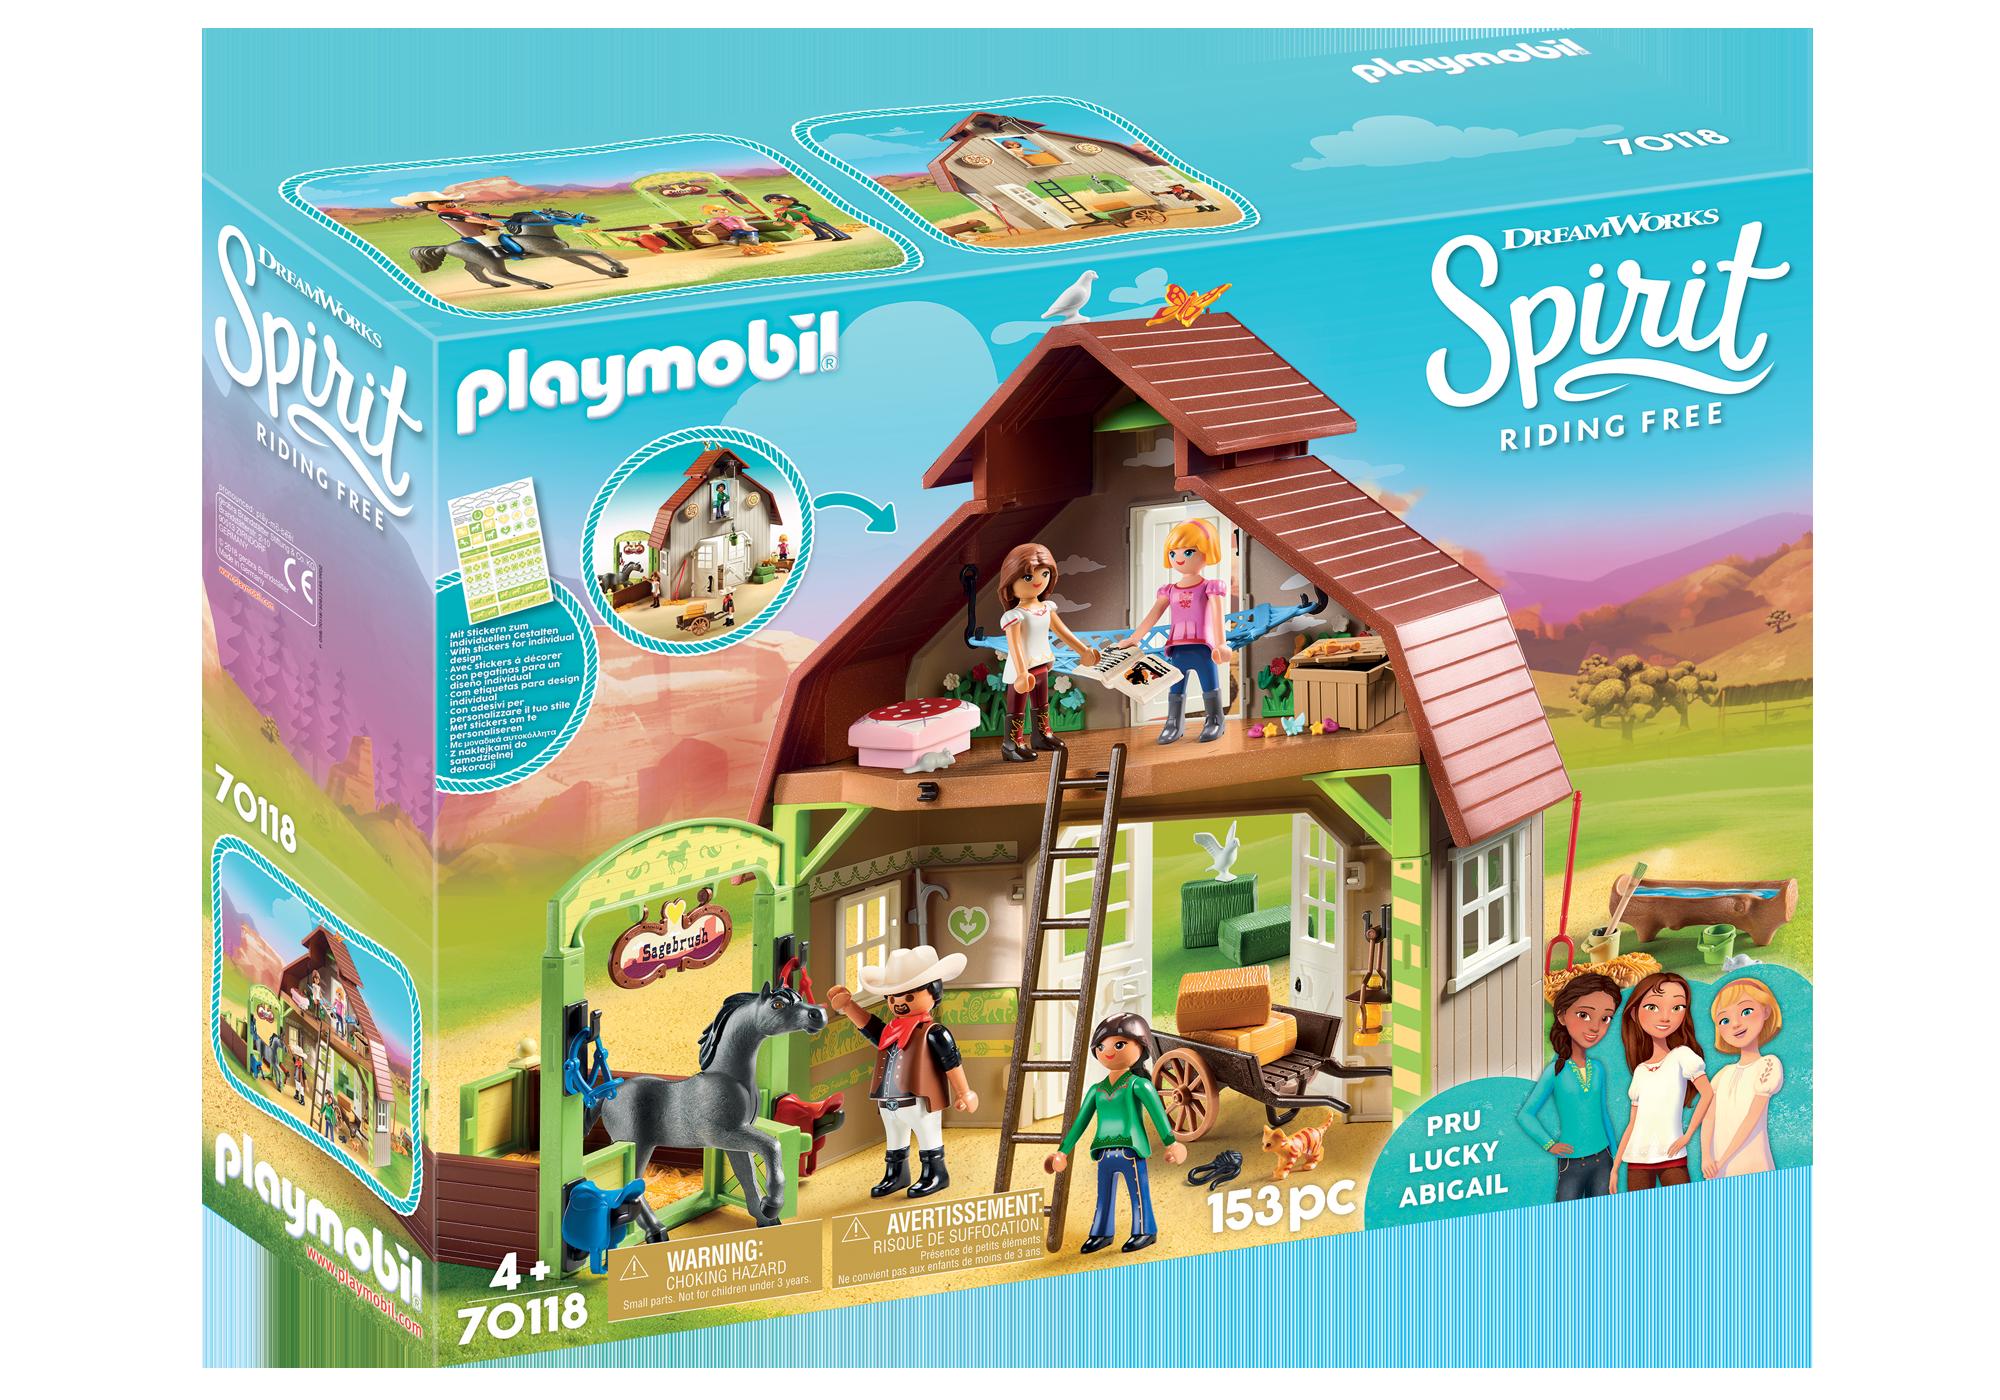 http://media.playmobil.com/i/playmobil/70118_product_box_front/Schuur met Lucky, Pru en Abigail